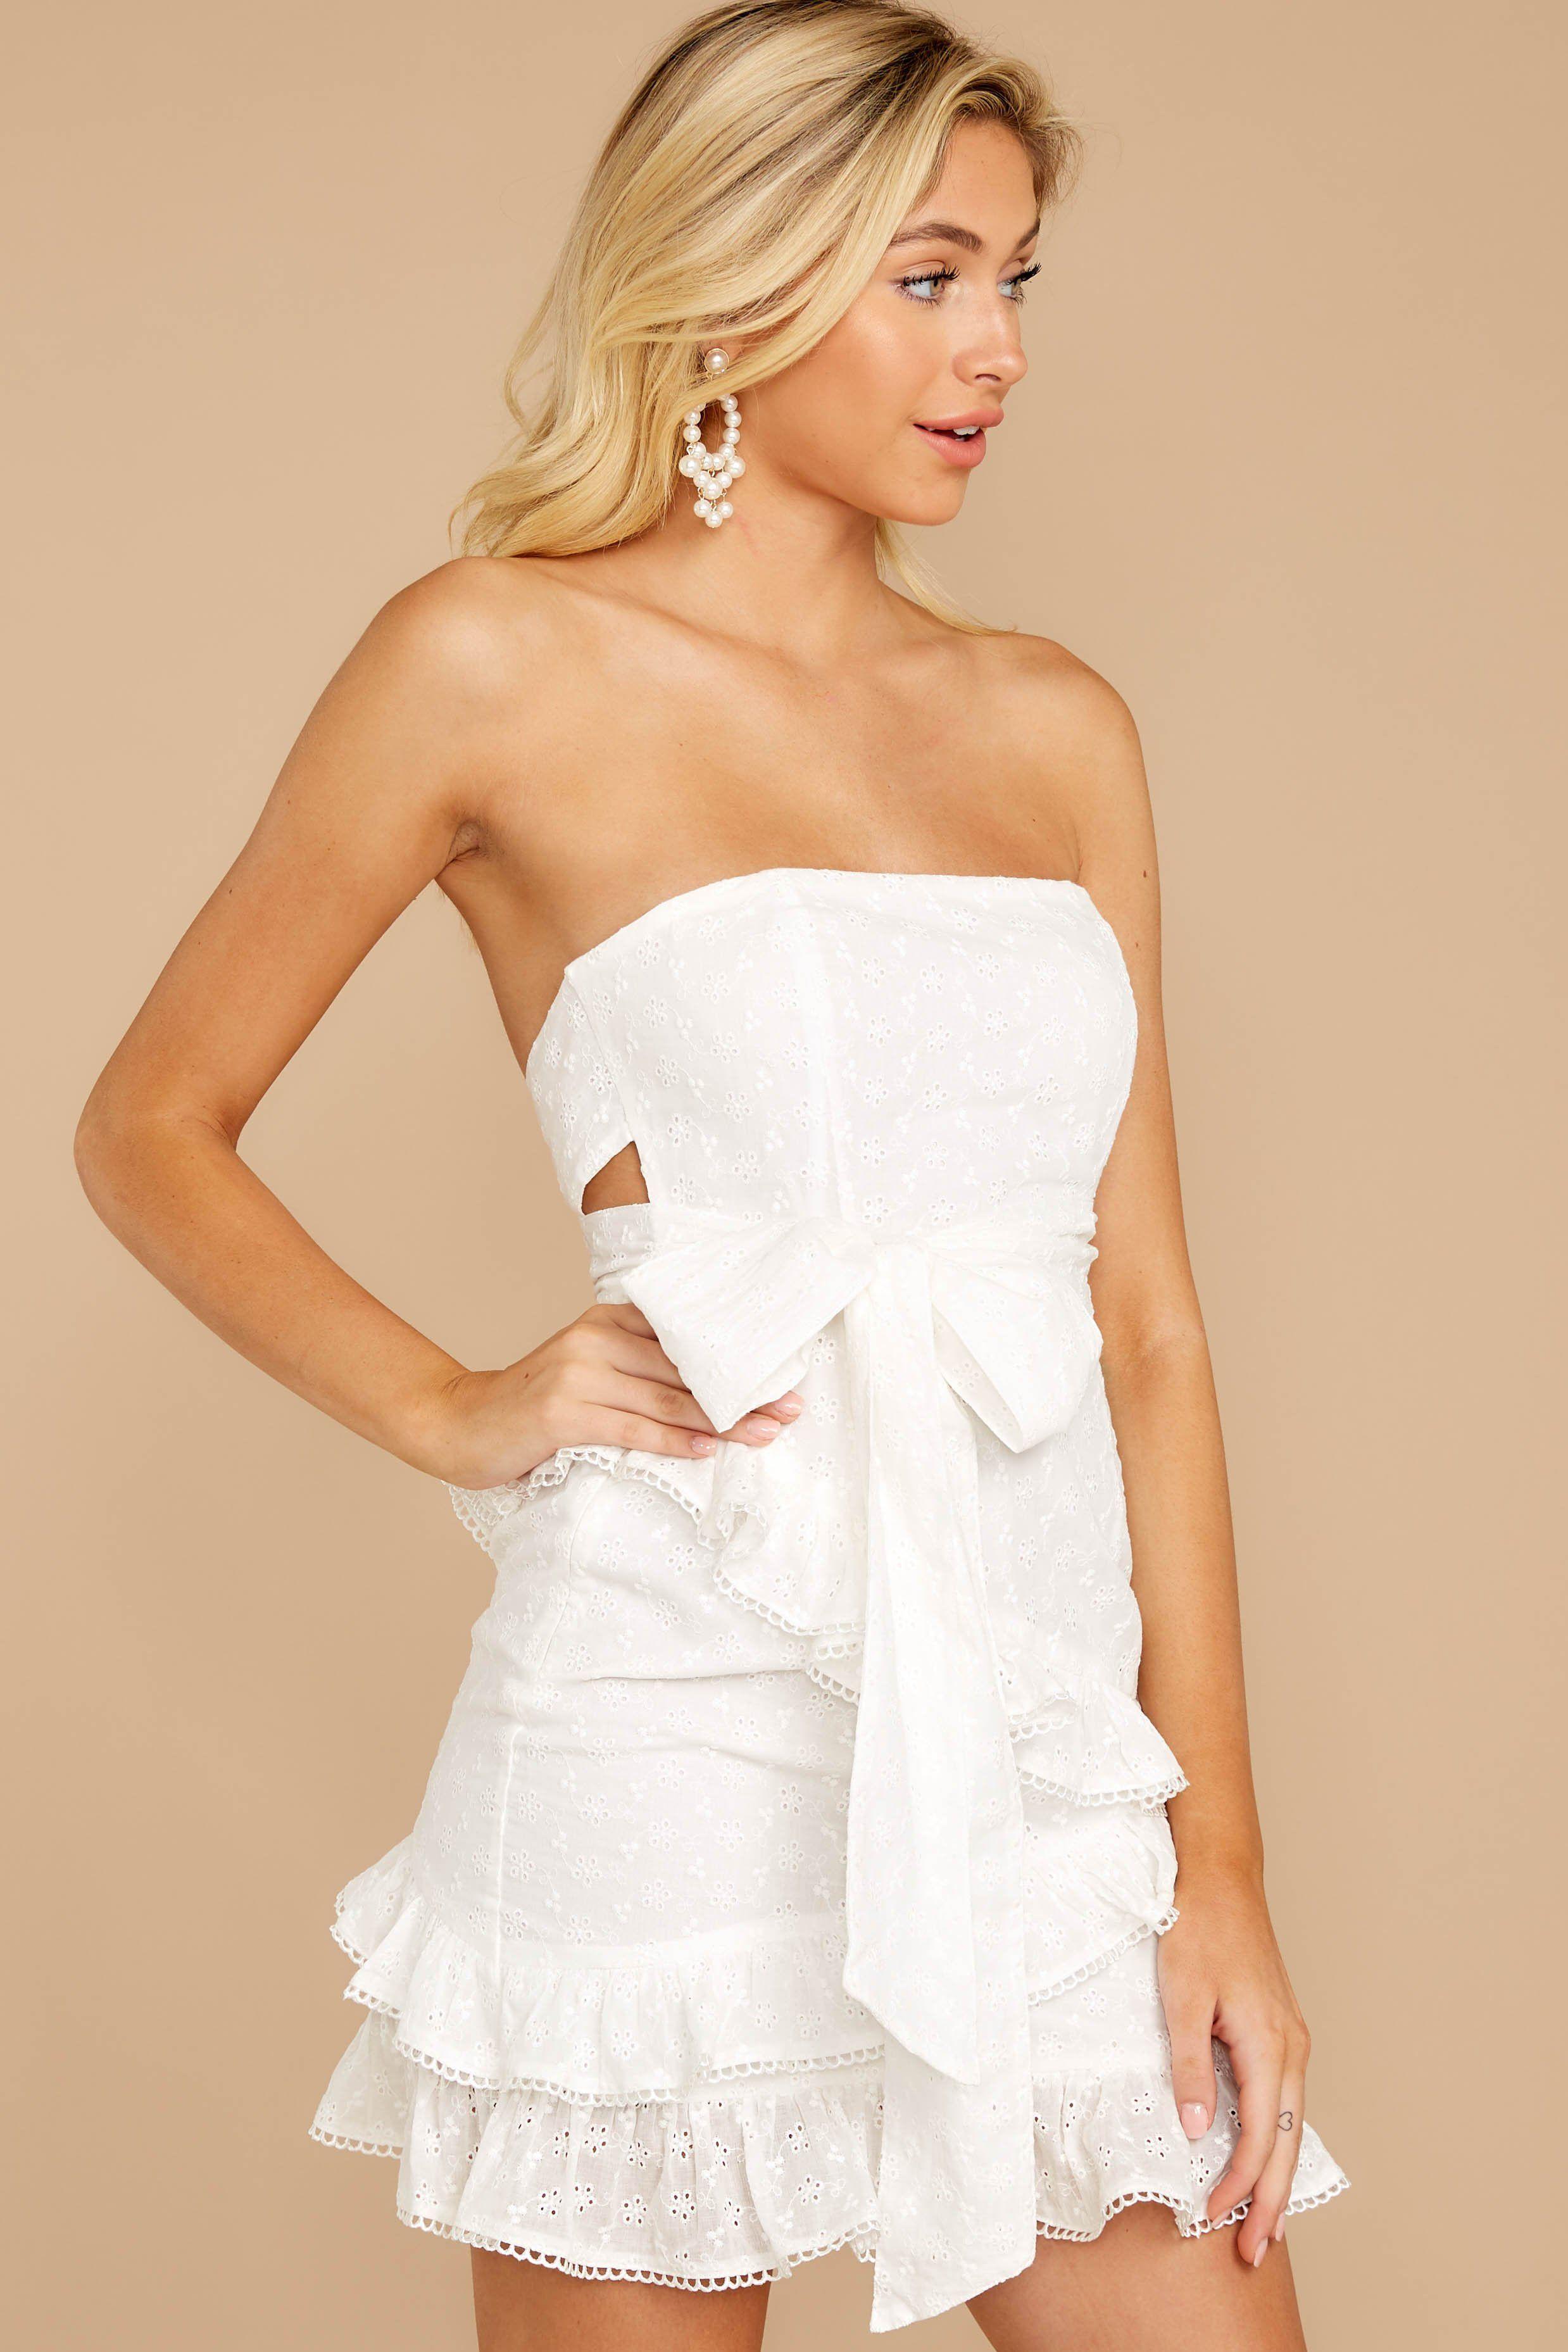 Chic White Eyelet Lace Dress Short Strapless Dress Dress 56 00 Red Dress Strapless Dresses Short Strapless Dress Red Dress [ 3715 x 2477 Pixel ]